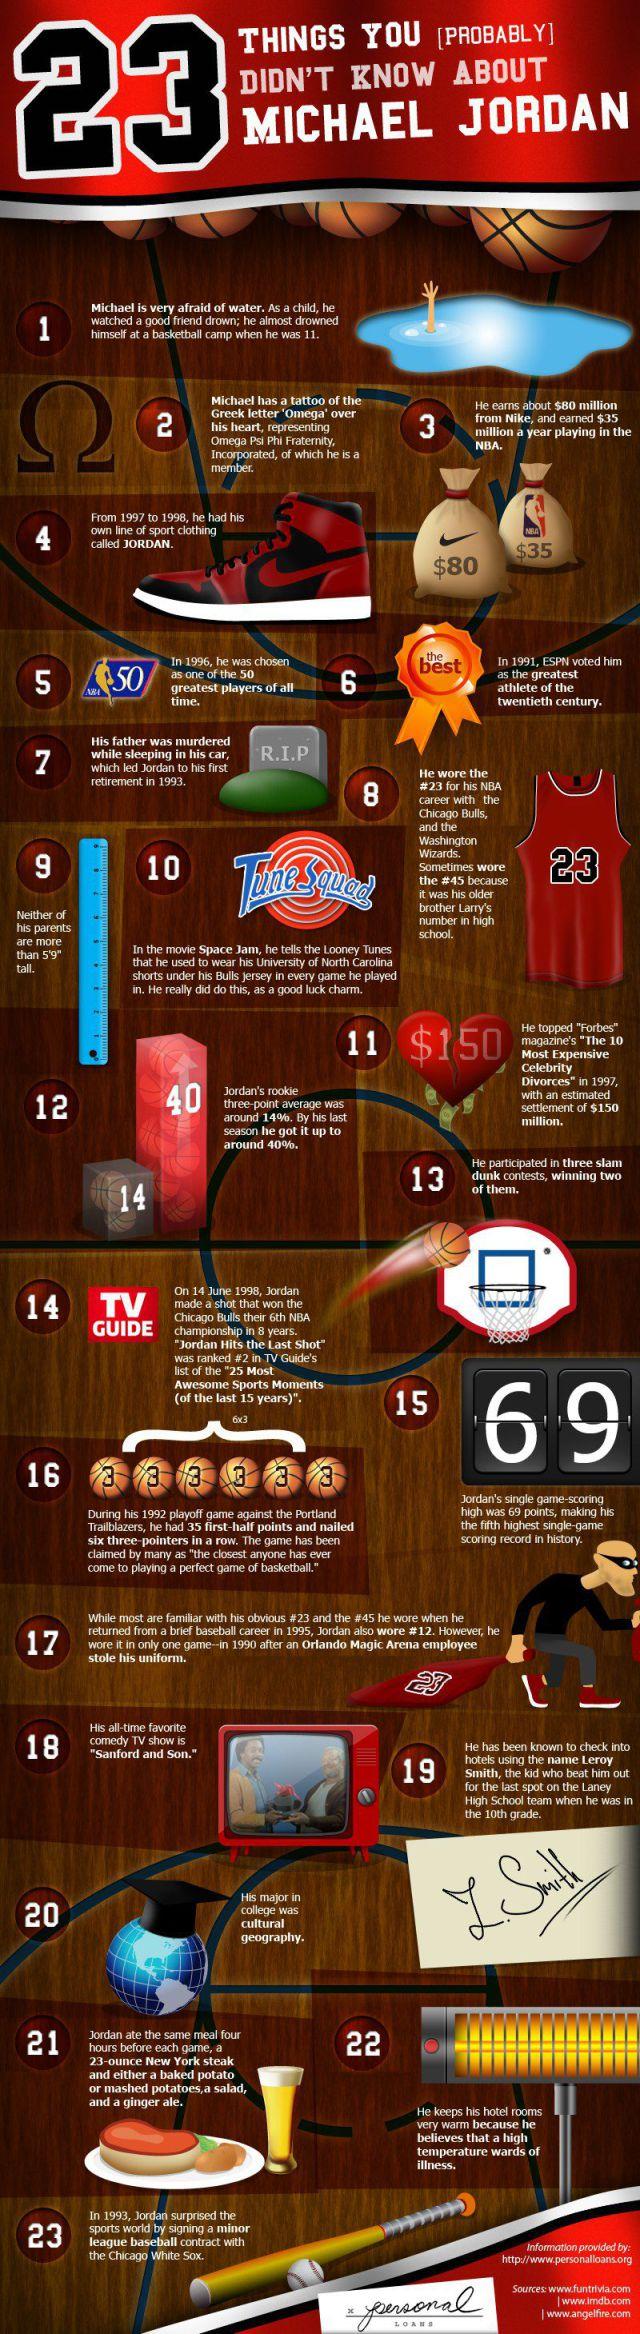 23 Amazing Michael Jordan Facts